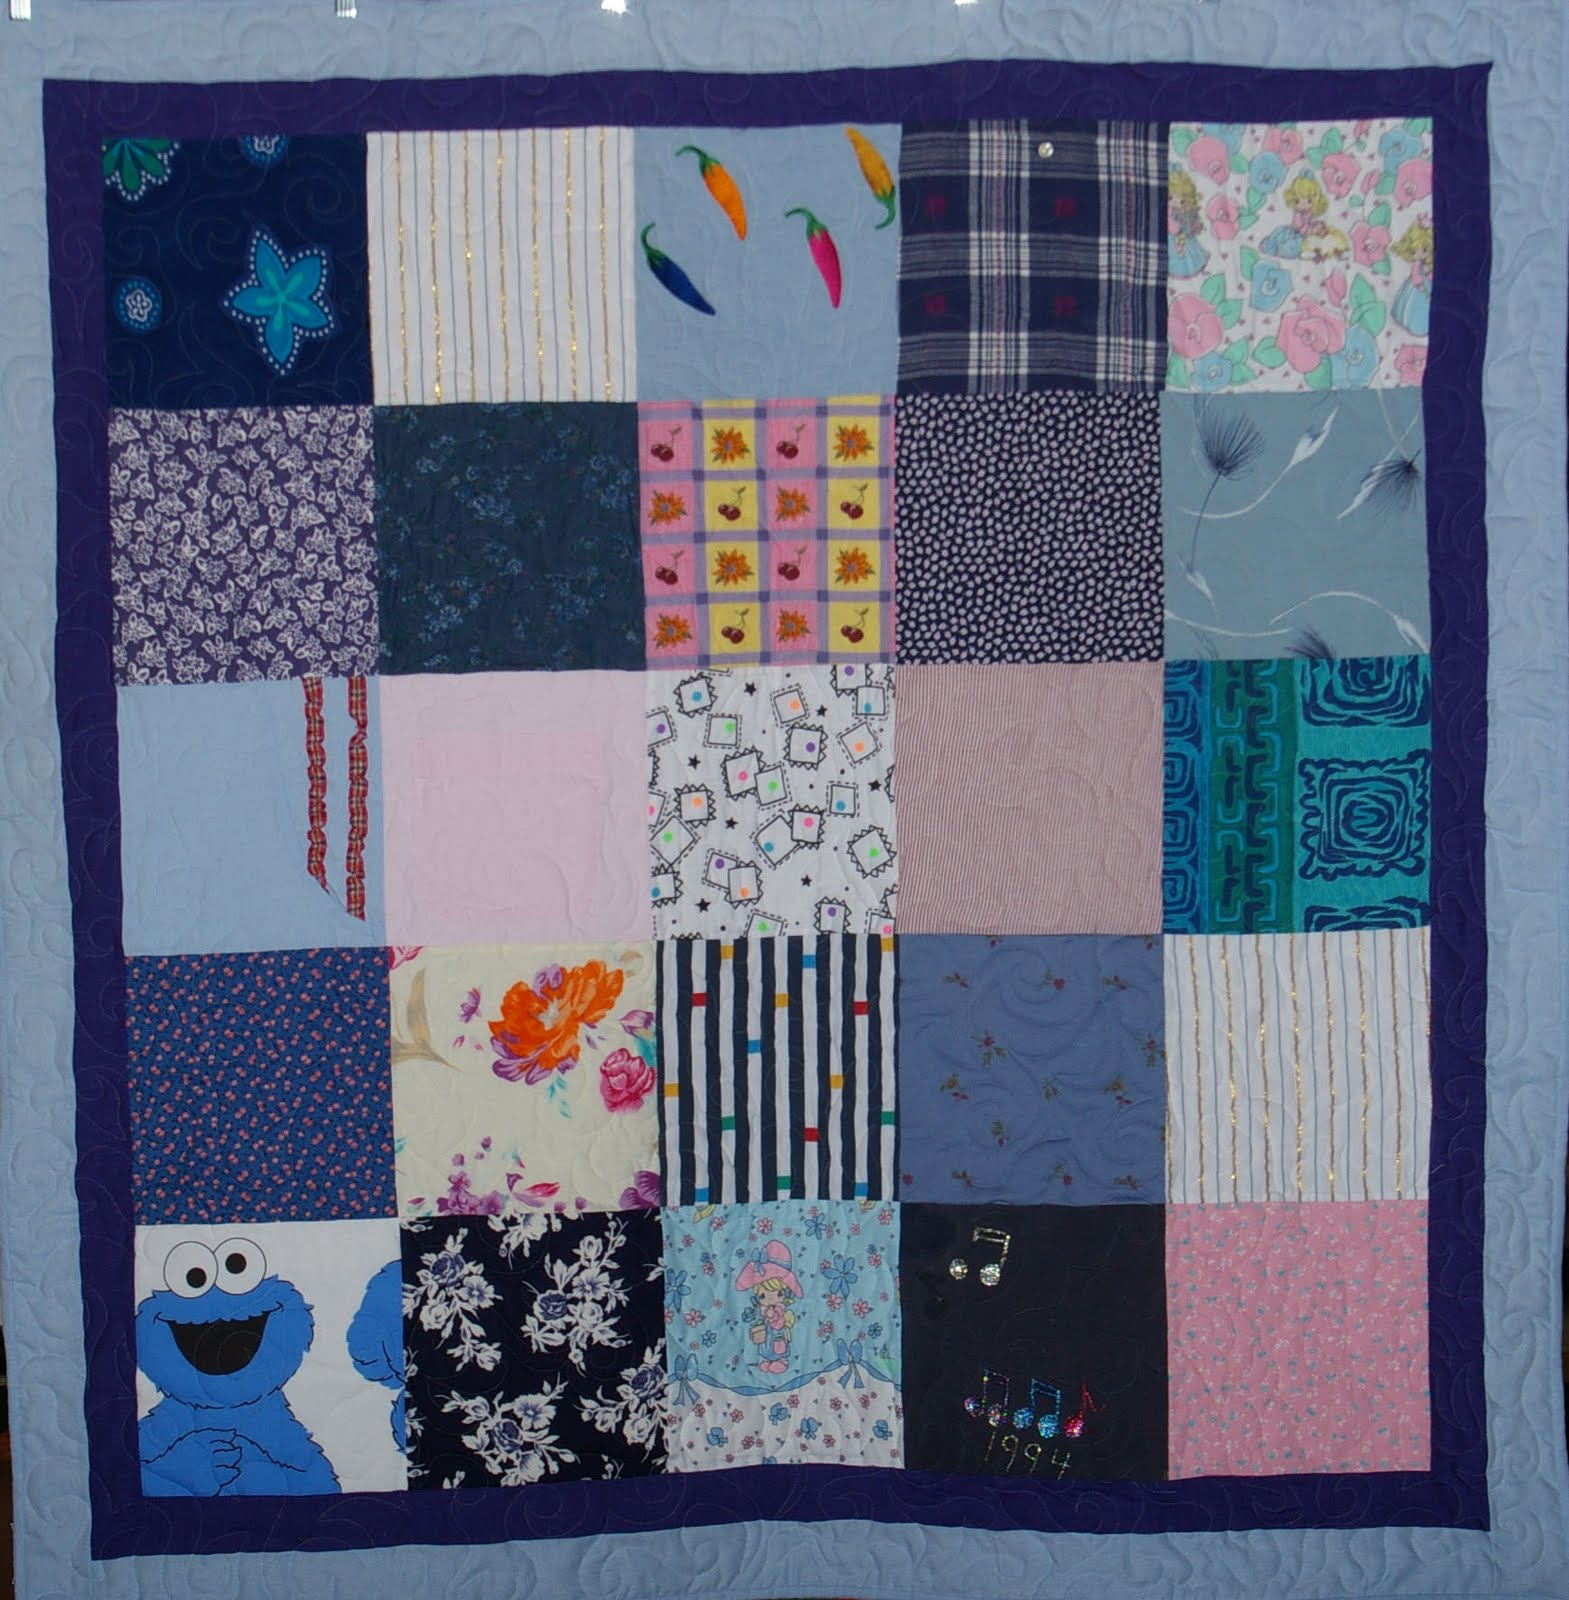 Deeply Felt Memorial Quilts   Over The Top Quilting Studio's Blog : memorial quilts - Adamdwight.com